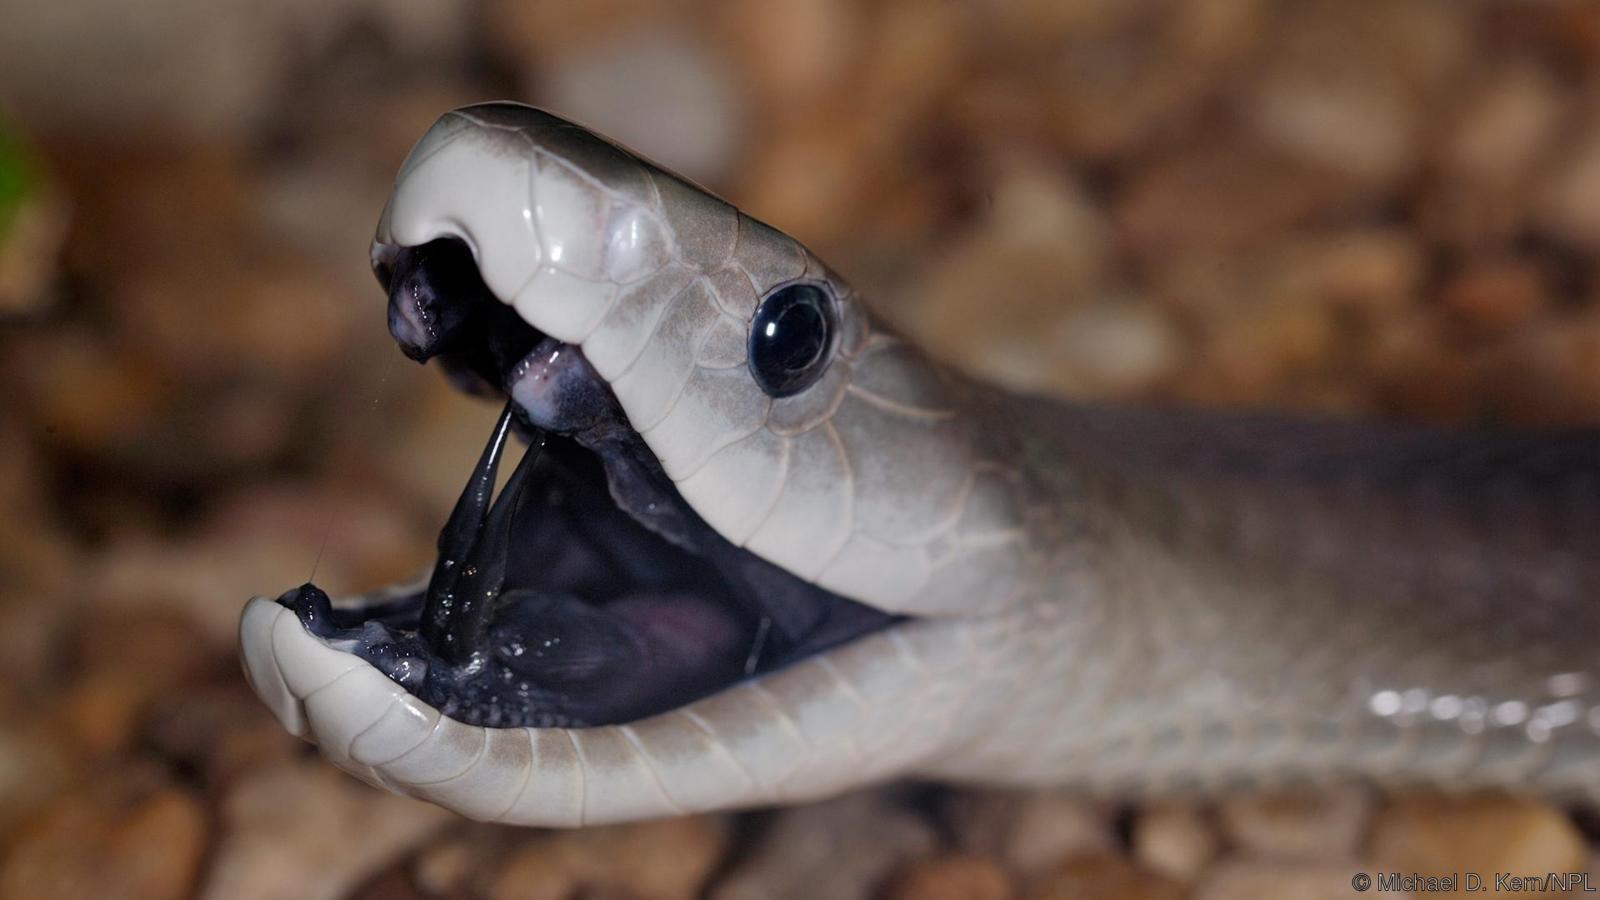 Mambayekî reş (Dendroaspis polylepis) (Jêder: Michael D. Kern/NPL)